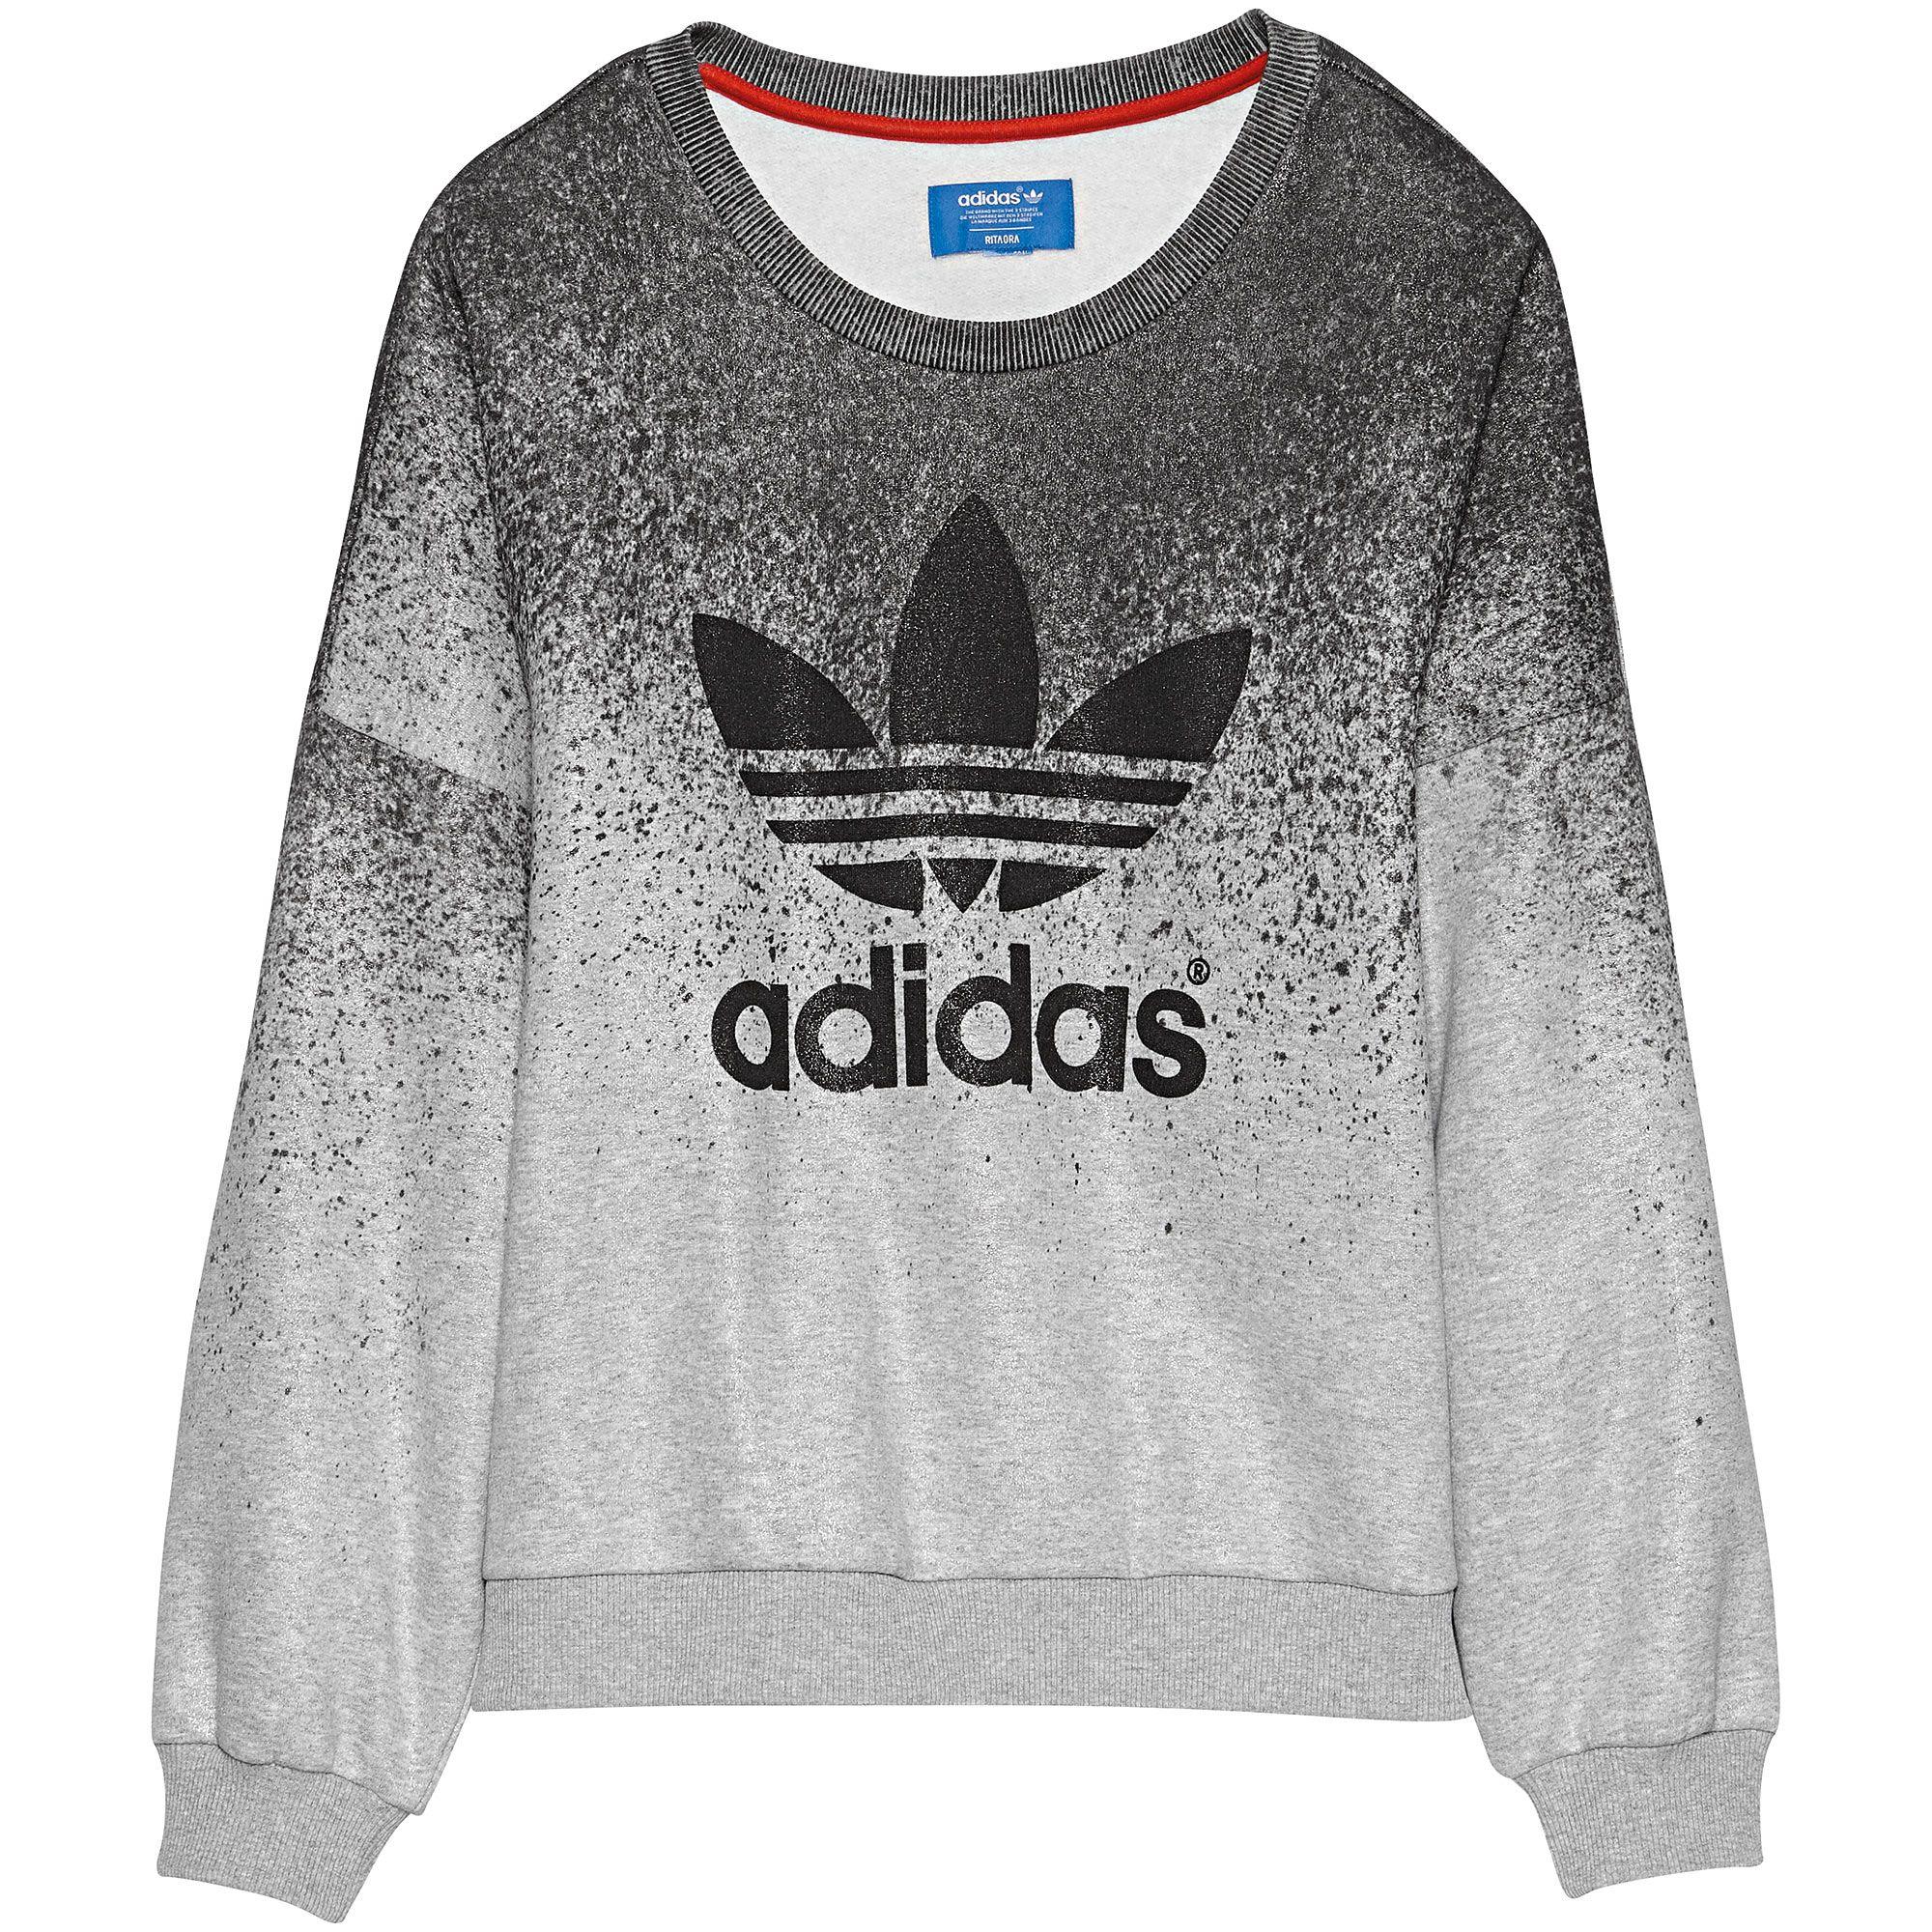 Sweat Shirt Rita Ora Adidas Adidas France Rita Ora Adidas Sweatshirts Adidas Sweatshirt [ 2000 x 2000 Pixel ]